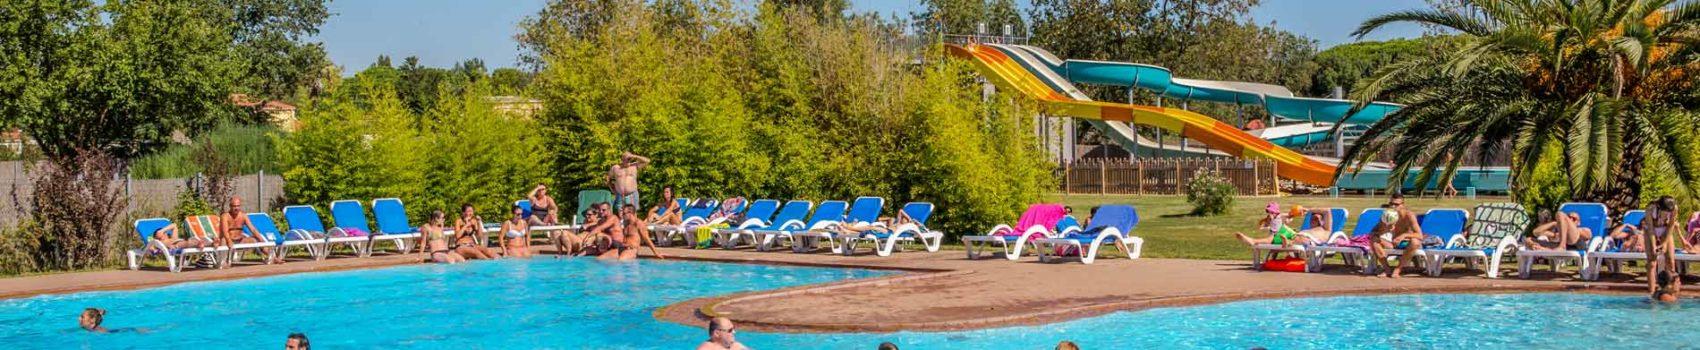 Piscine argeles sur mer camping zwembad argeles sur mer for Camping blonville sur mer avec piscine